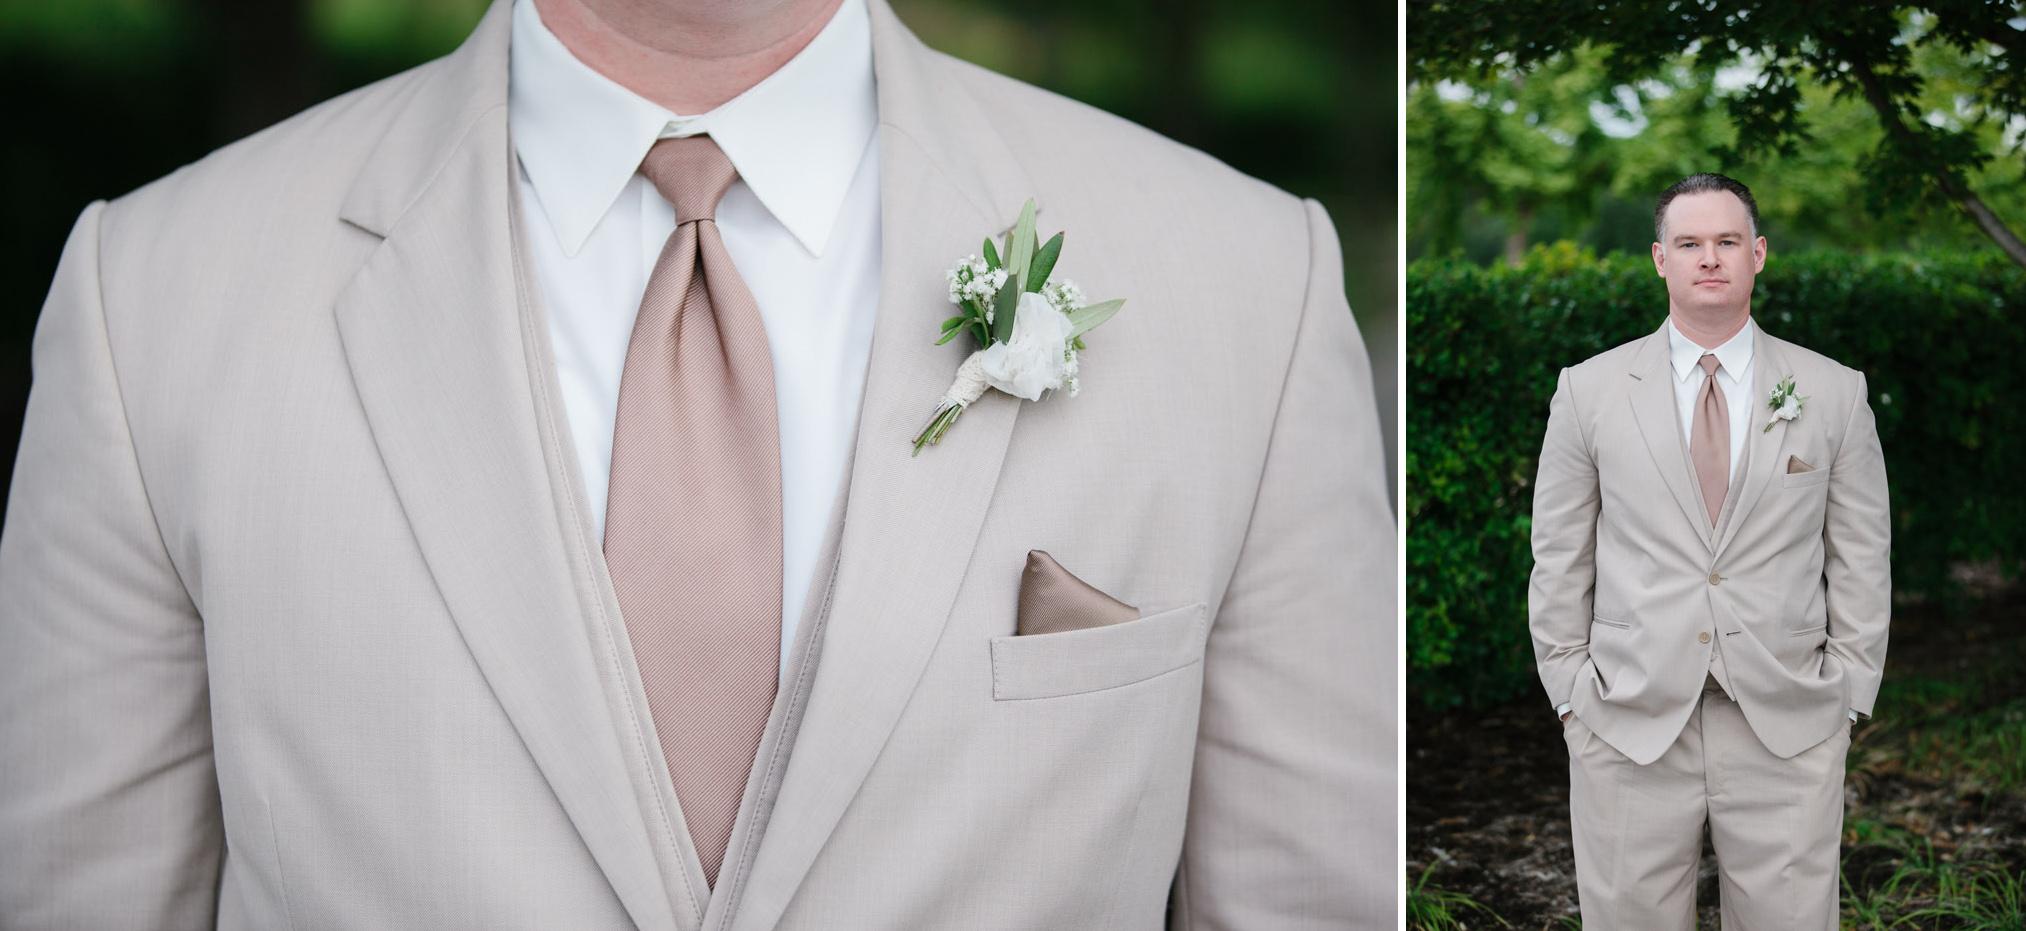 St-Louis-Wedding-Photography-1055-copy.jpg